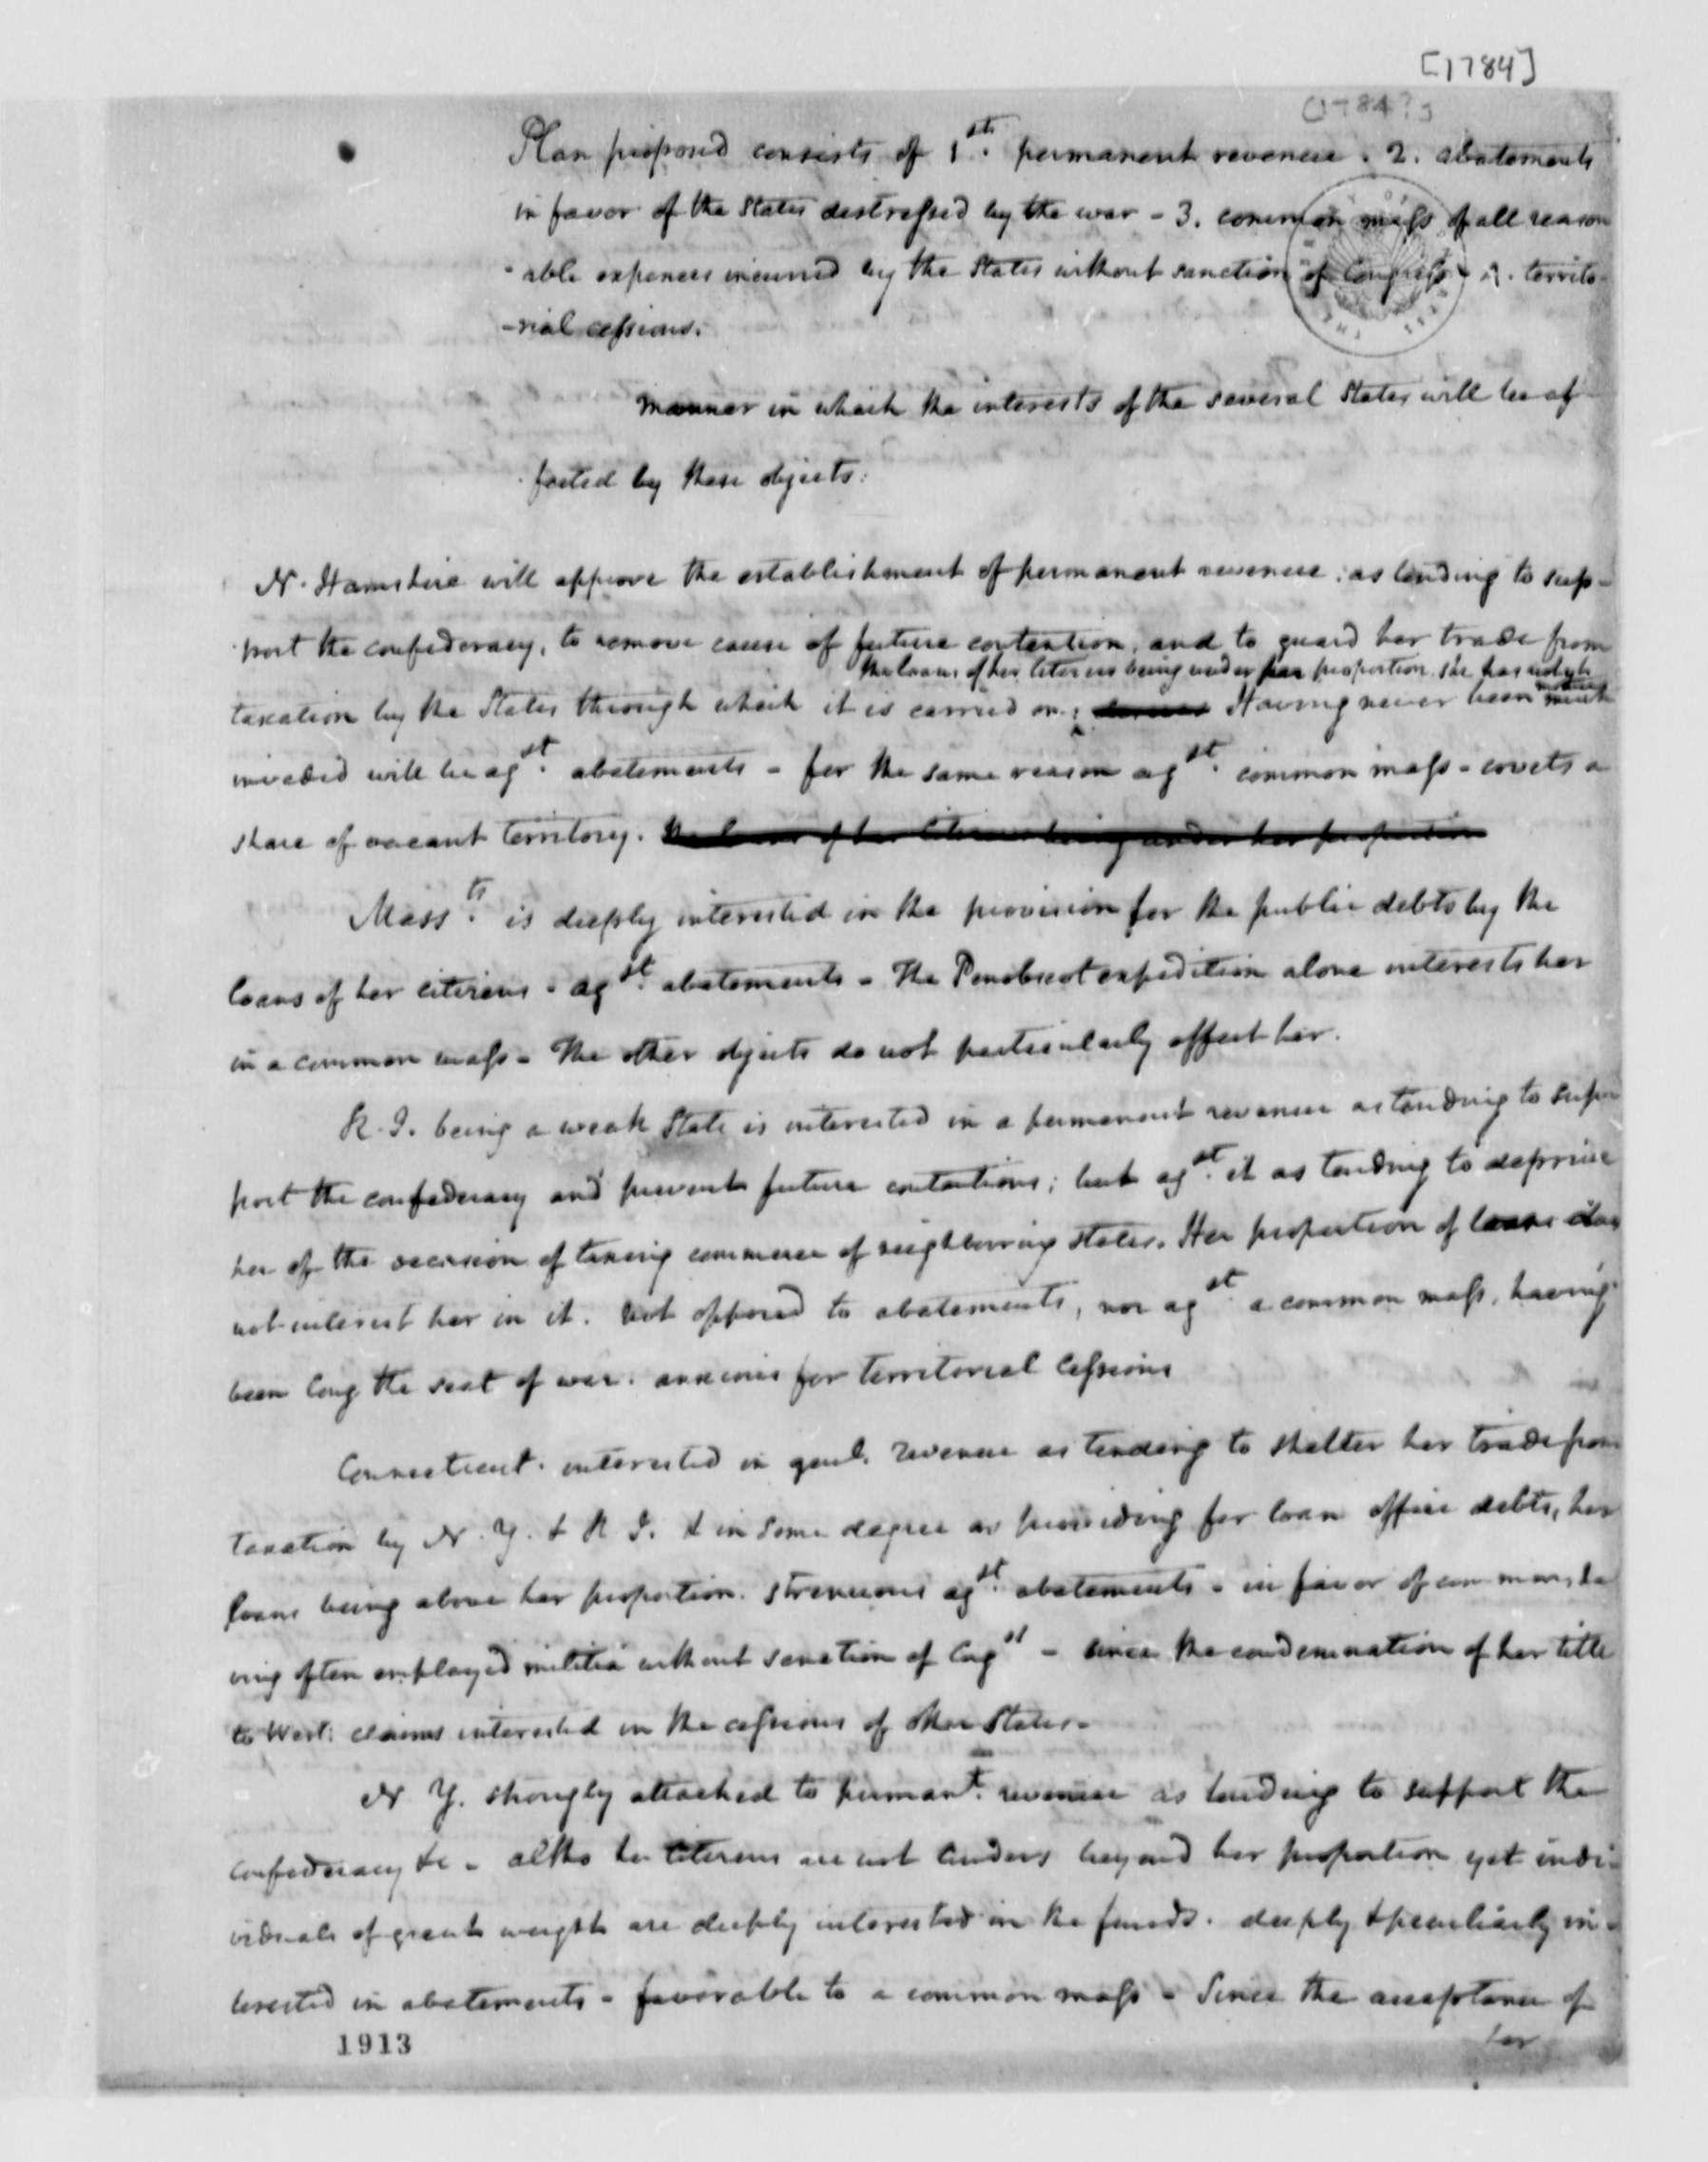 James Madison Memorandum On Plan For Permanent Revenue Affect On States